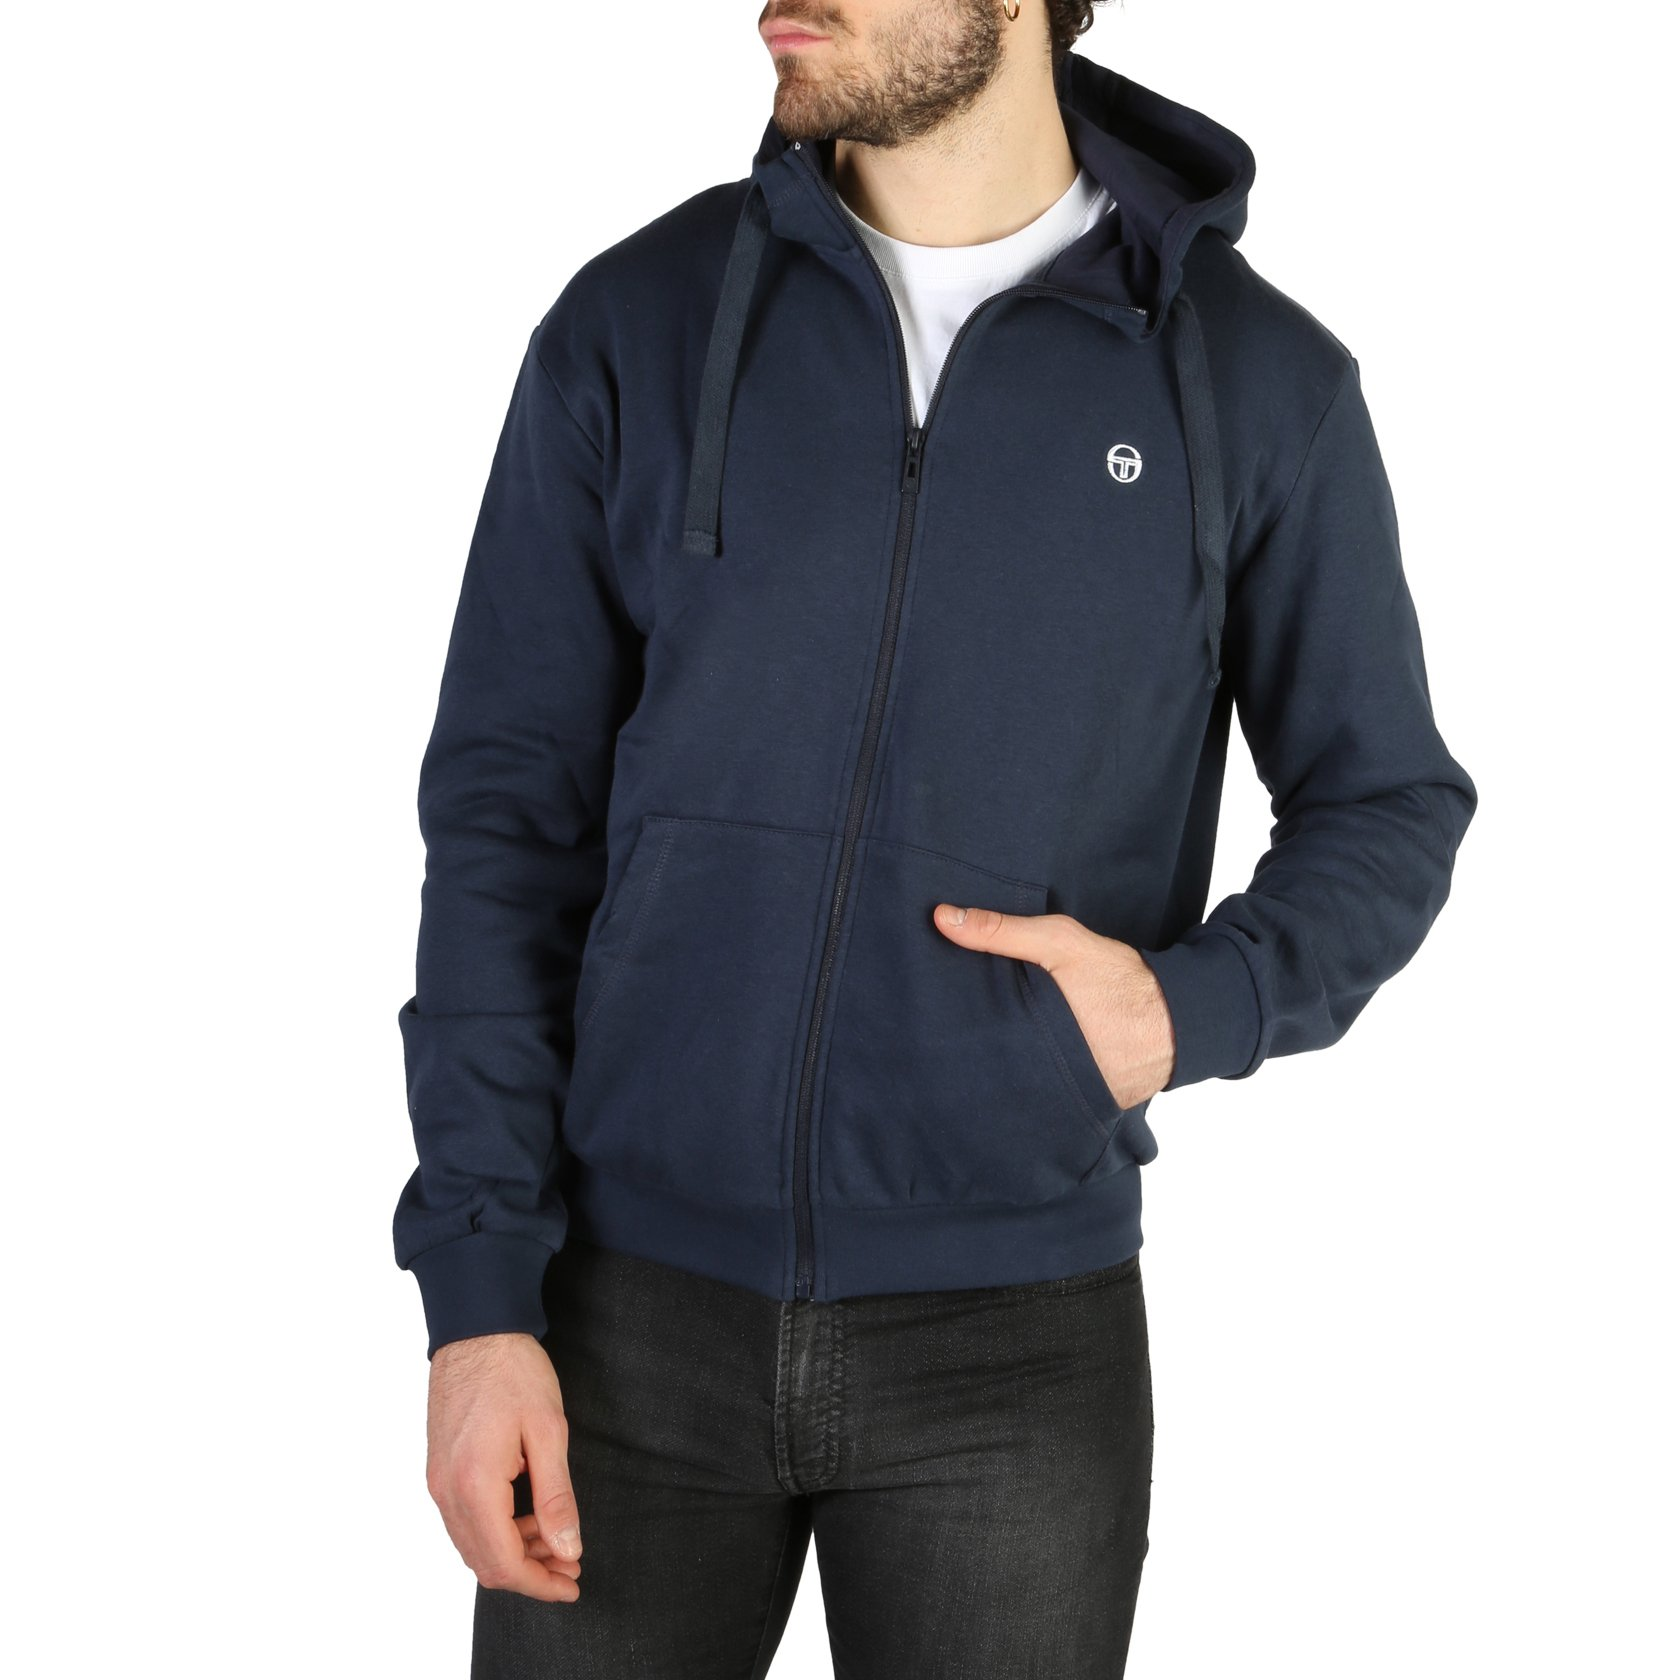 Sergio Tacchini Men's Sweatshirt Various Colours 103-10001 - blue M